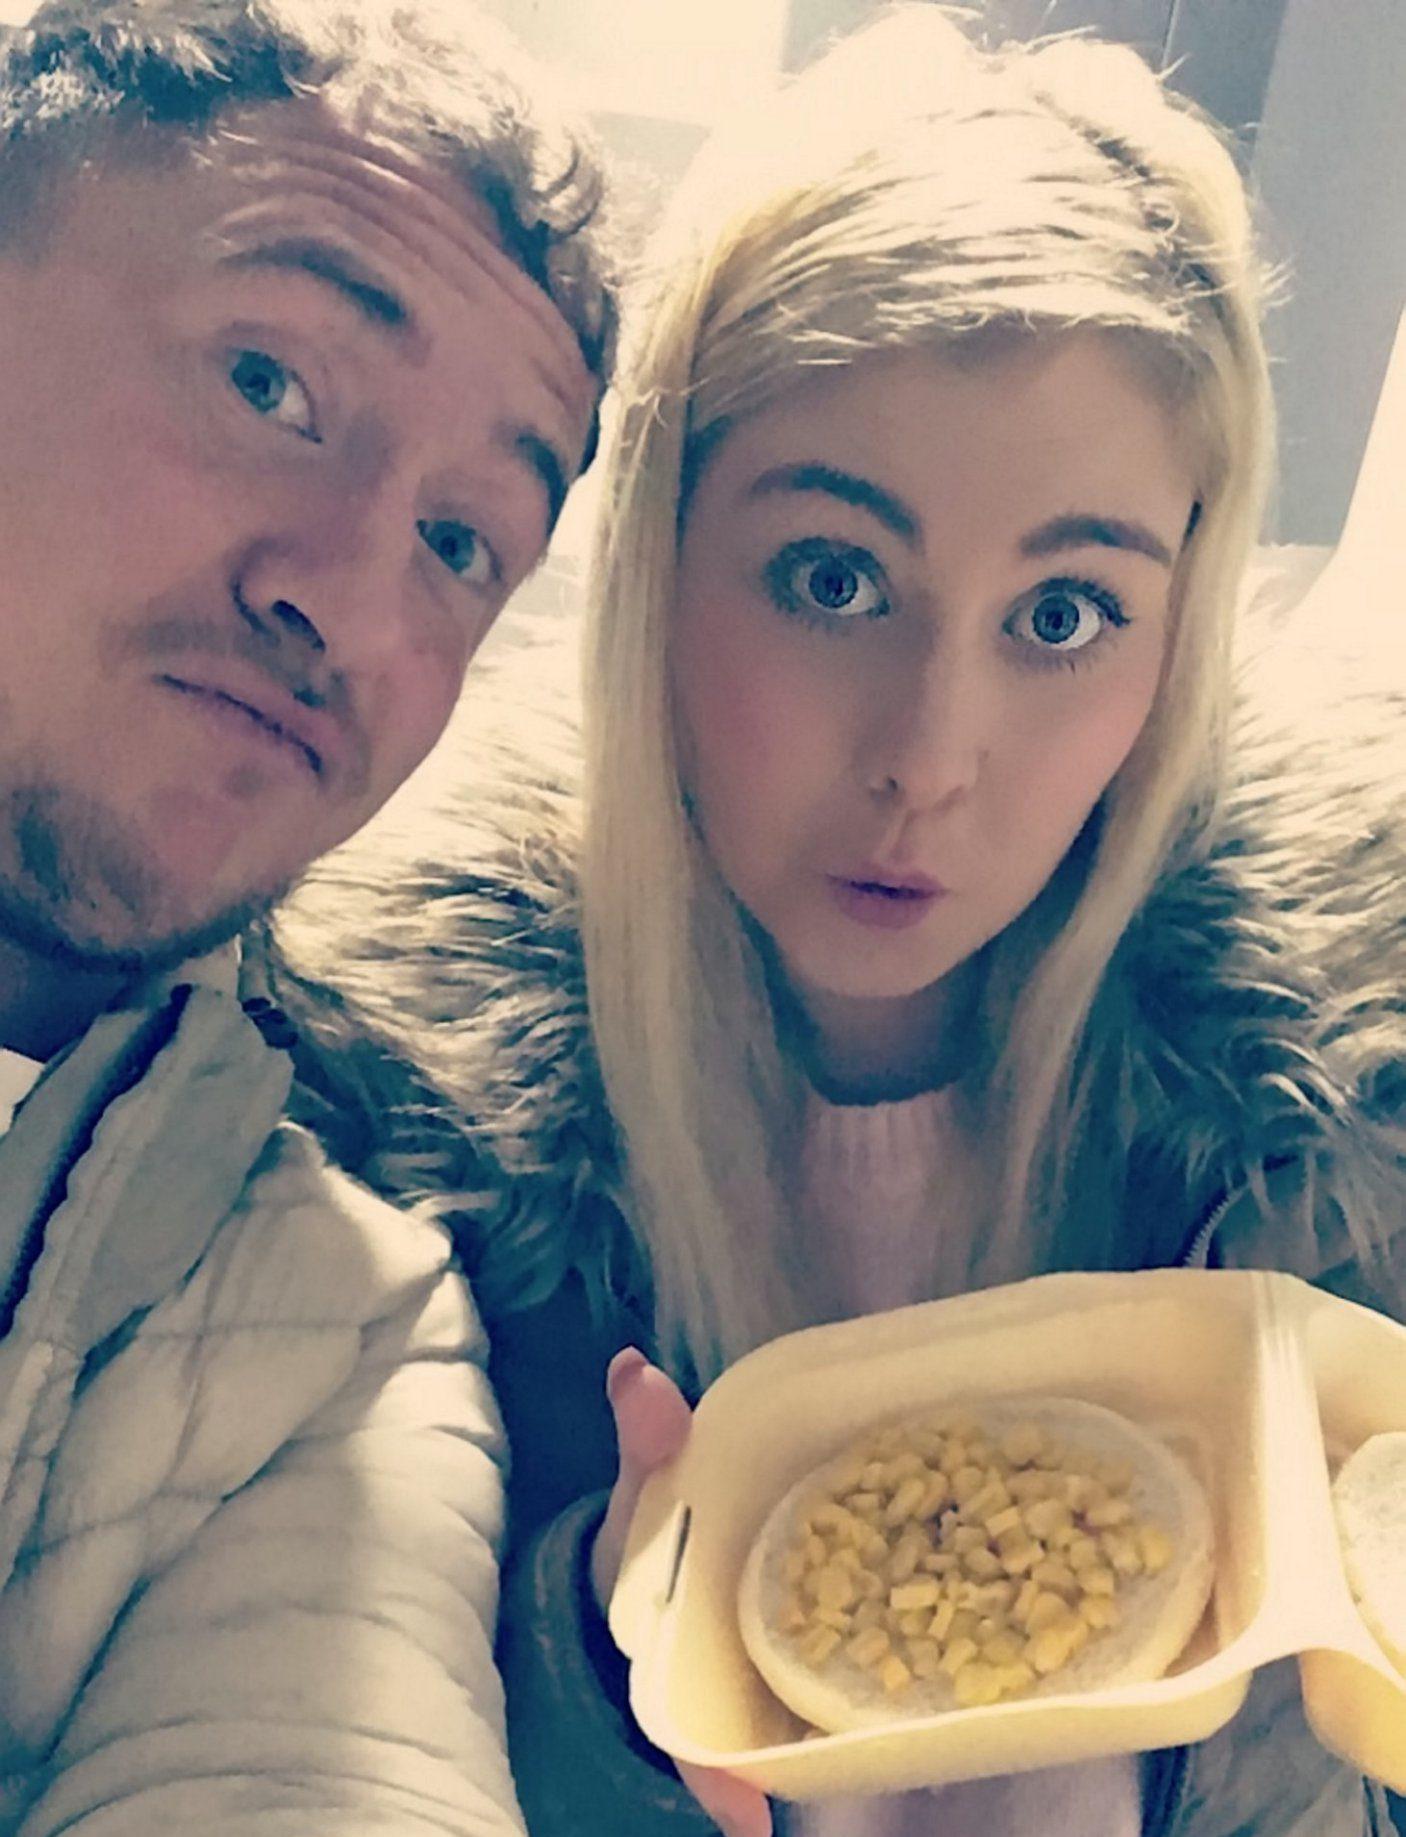 Couple ordered corn on the cob got corn on a cob